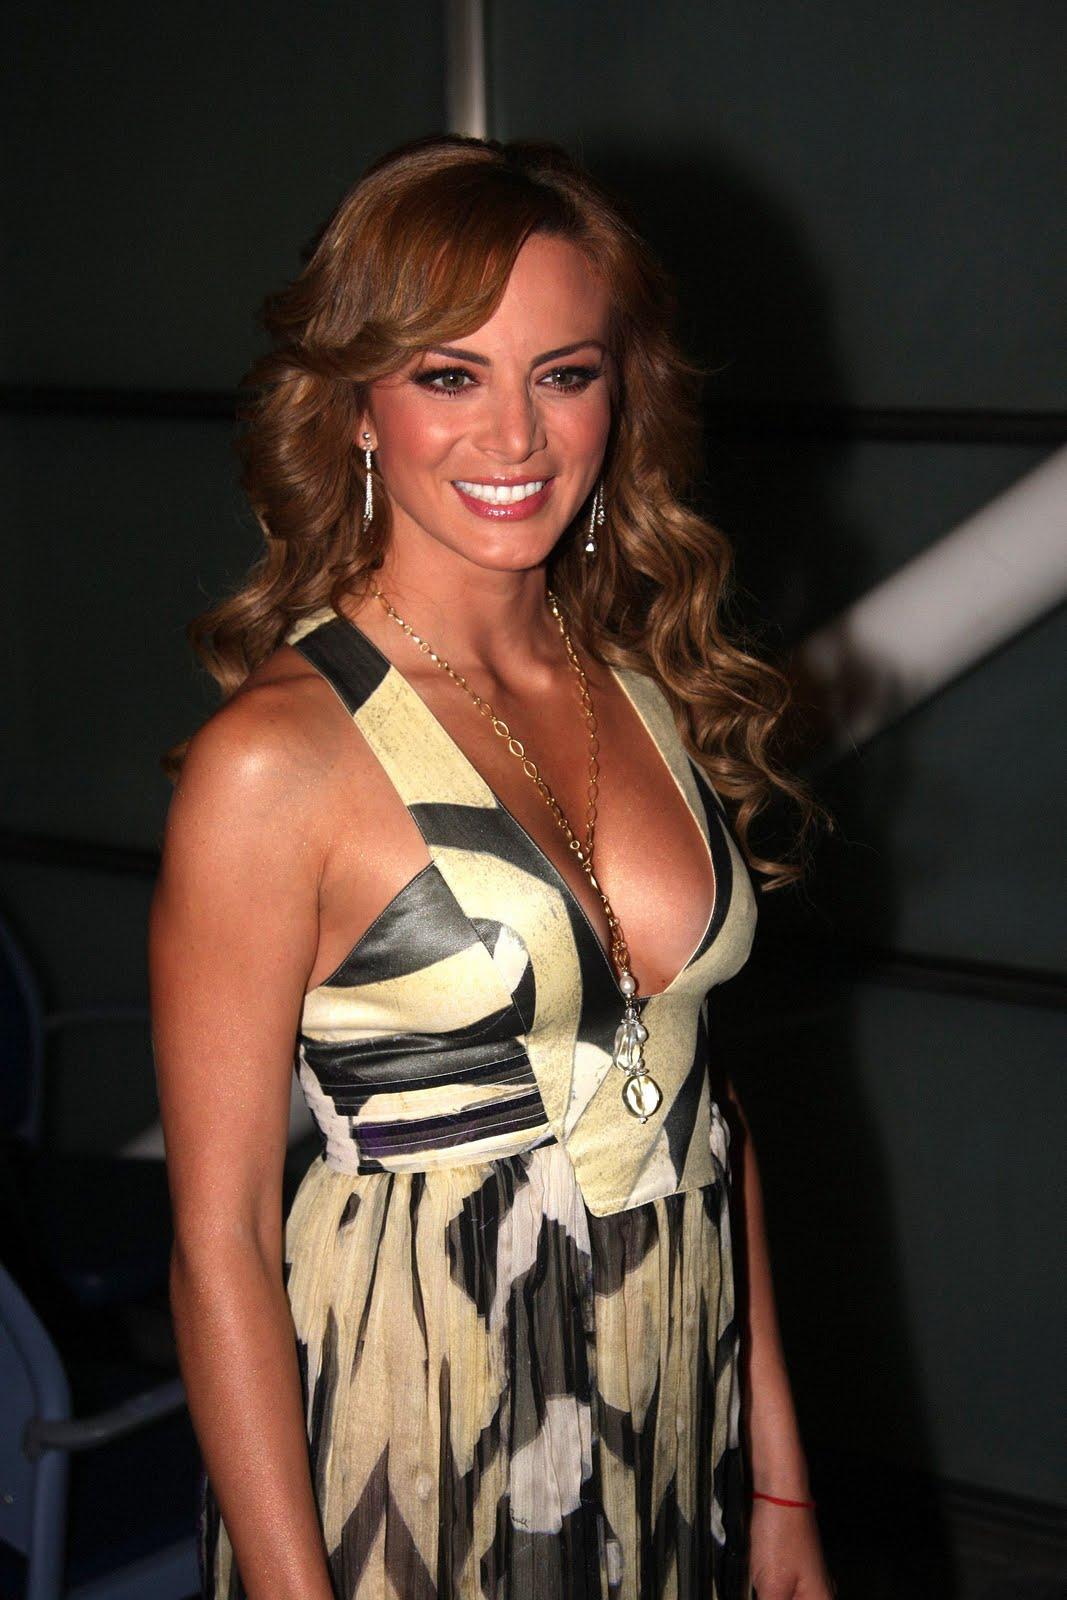 http://2.bp.blogspot.com/-rgRgRhu7NlU/TxYQQocfoJI/AAAAAAAADF0/vGvghzEkYOs/s1600/Silvia_Navarro_LOKY%2B%25283%2529.jpg